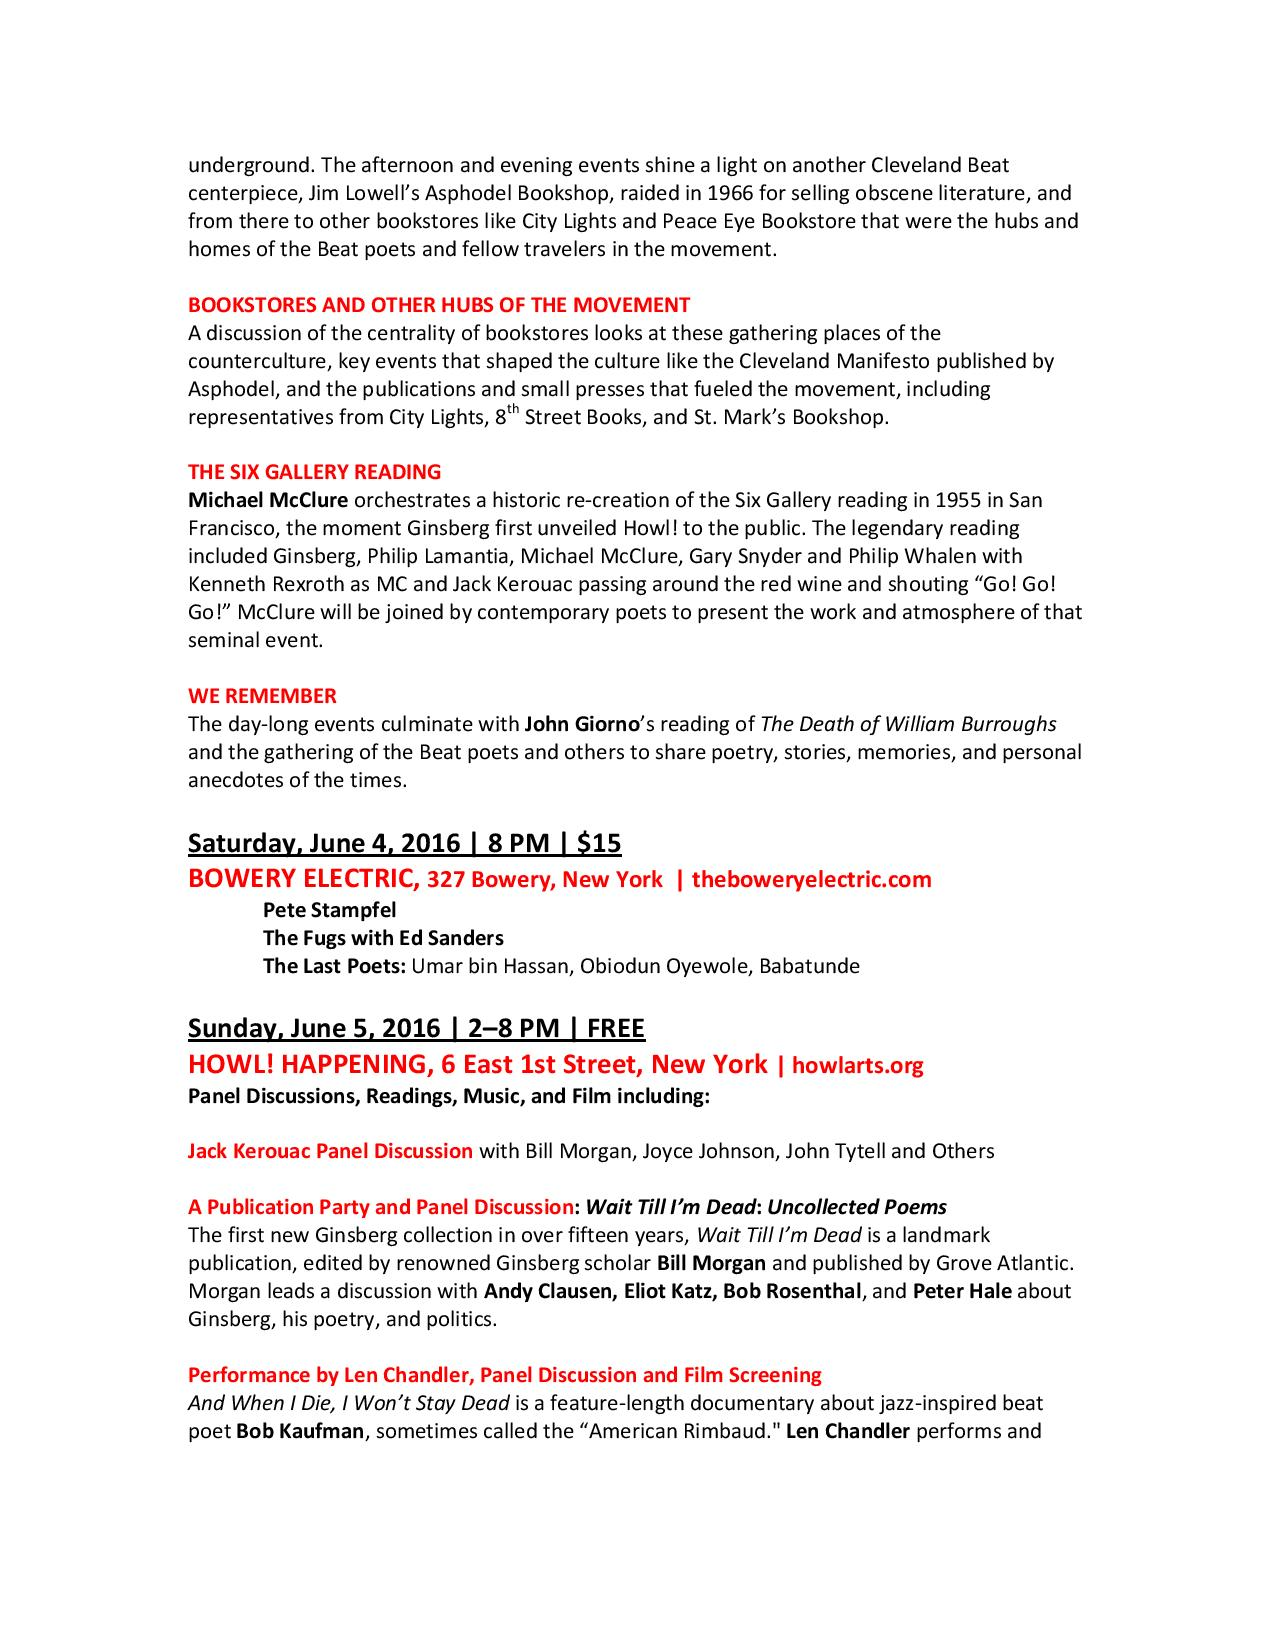 Beat&Beyond PR.050816v2-page-003